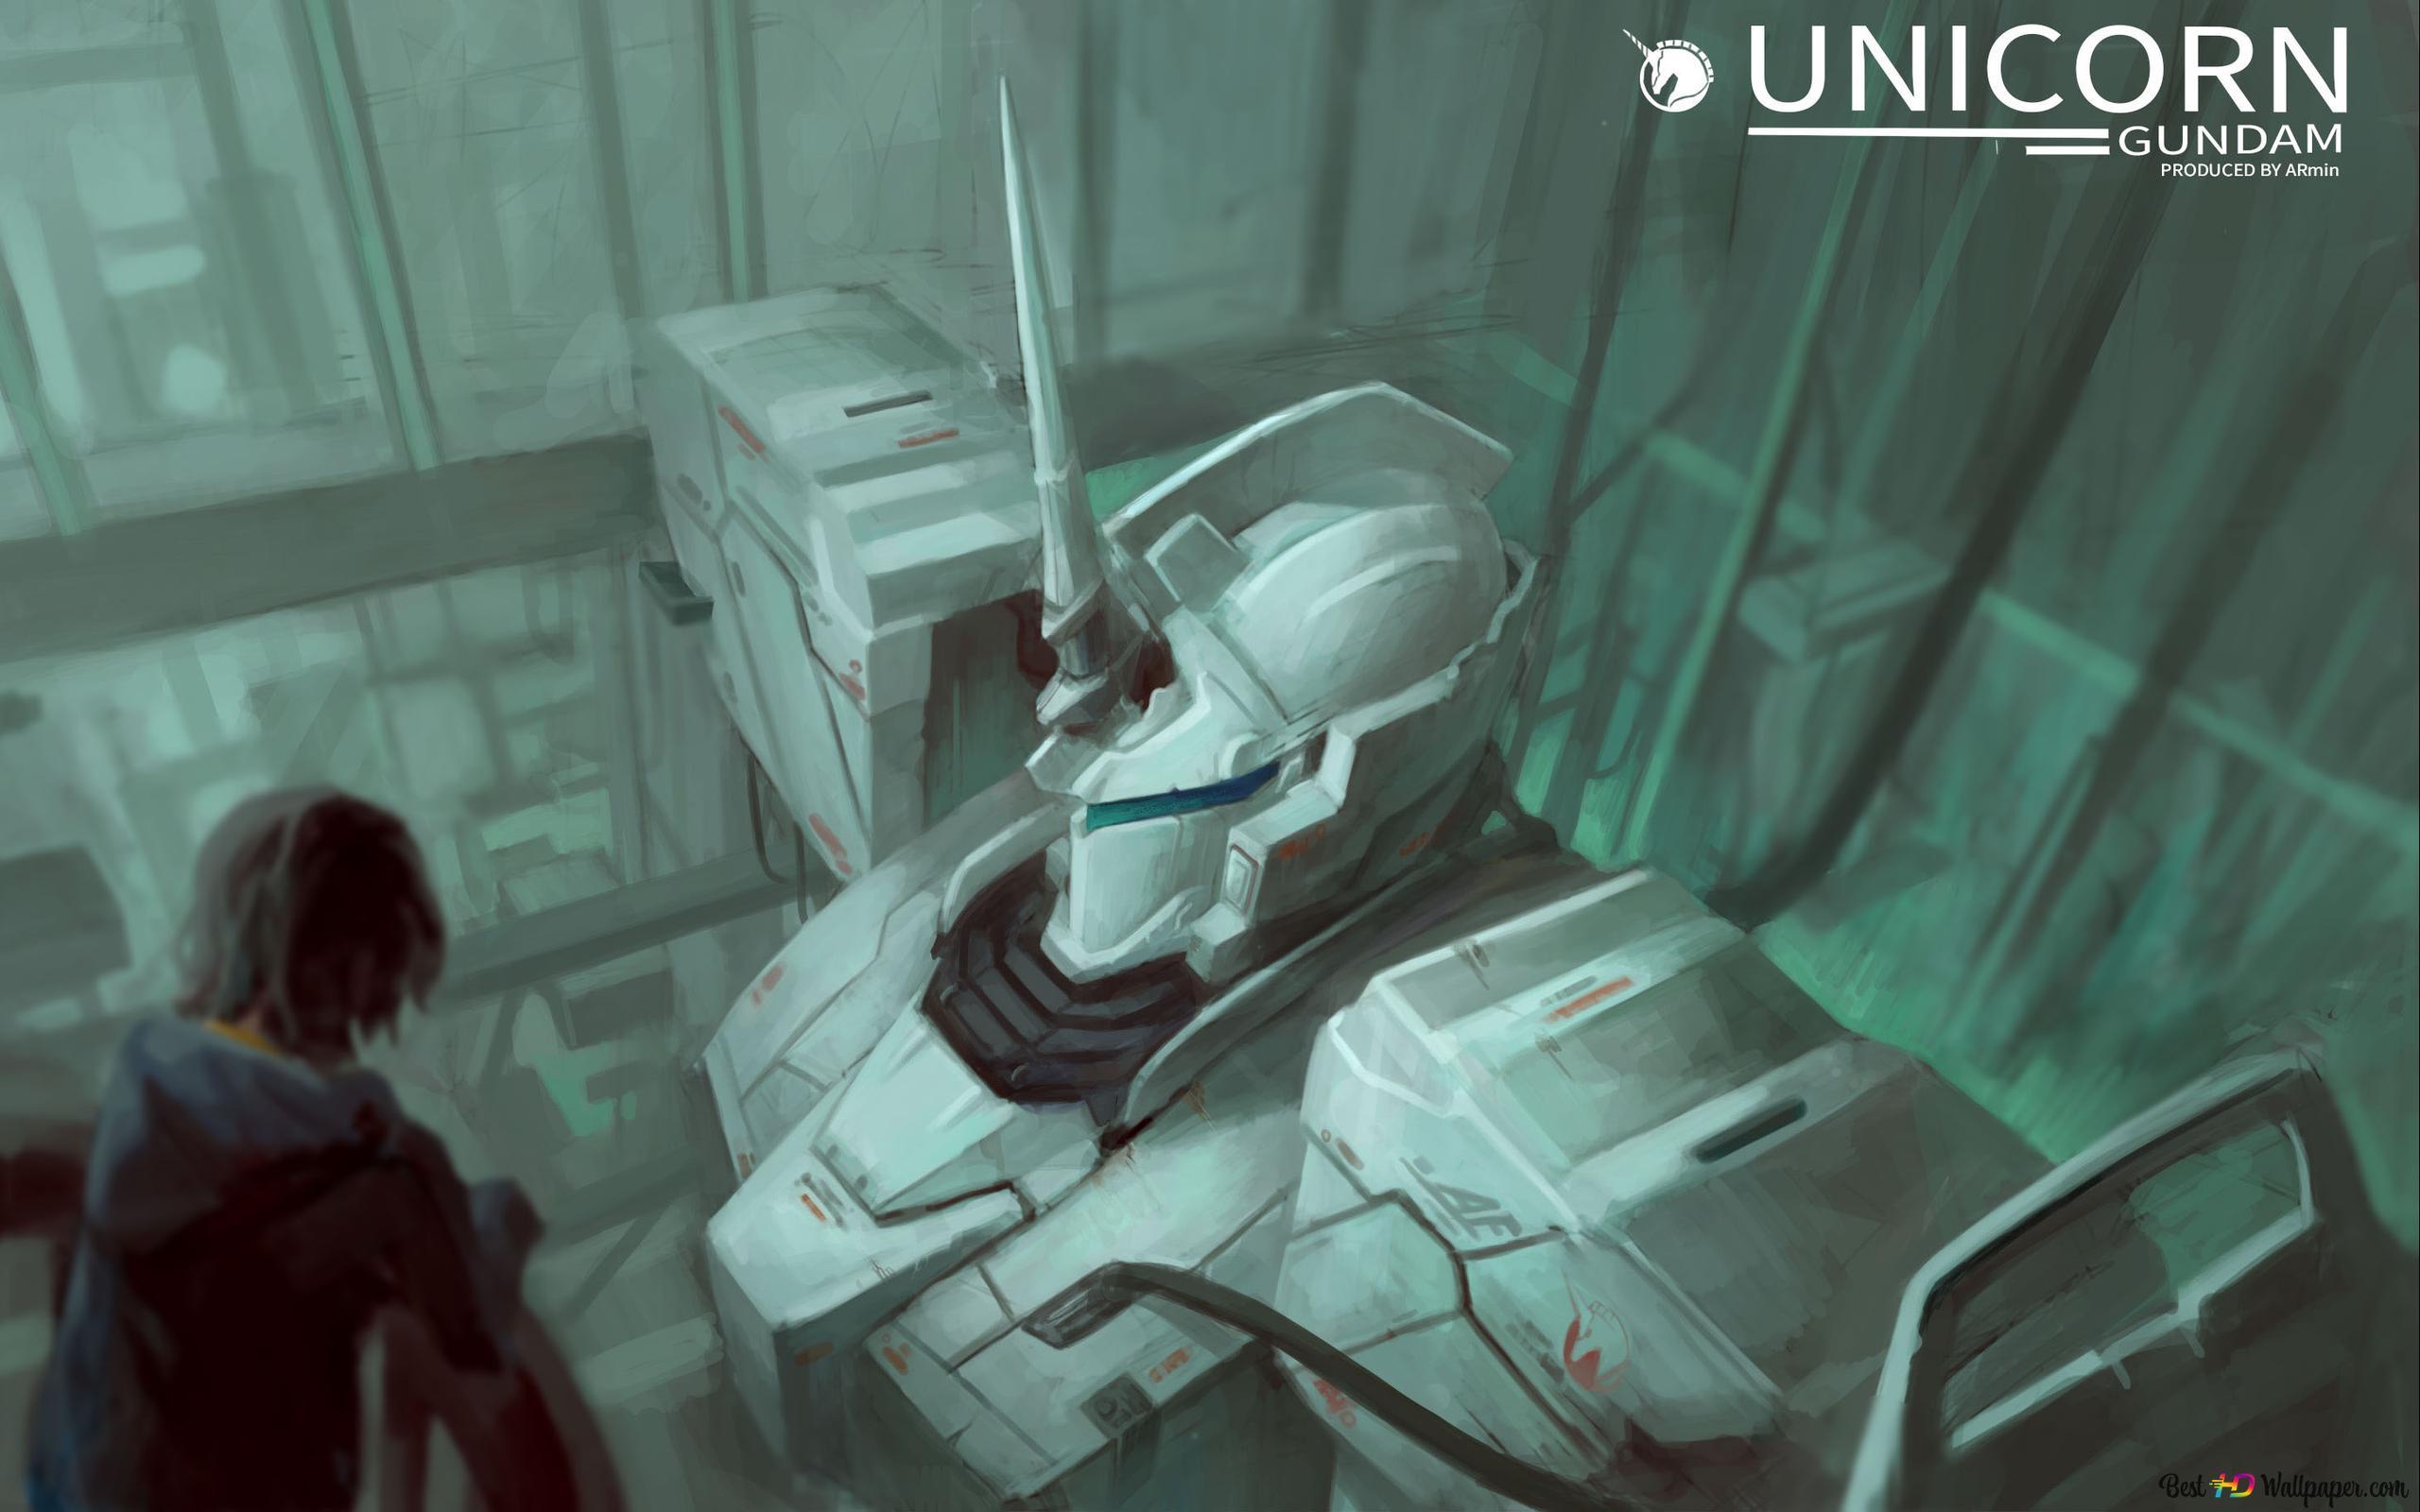 Mobile Suit Gundam Unicorn Hd Wallpaper Download